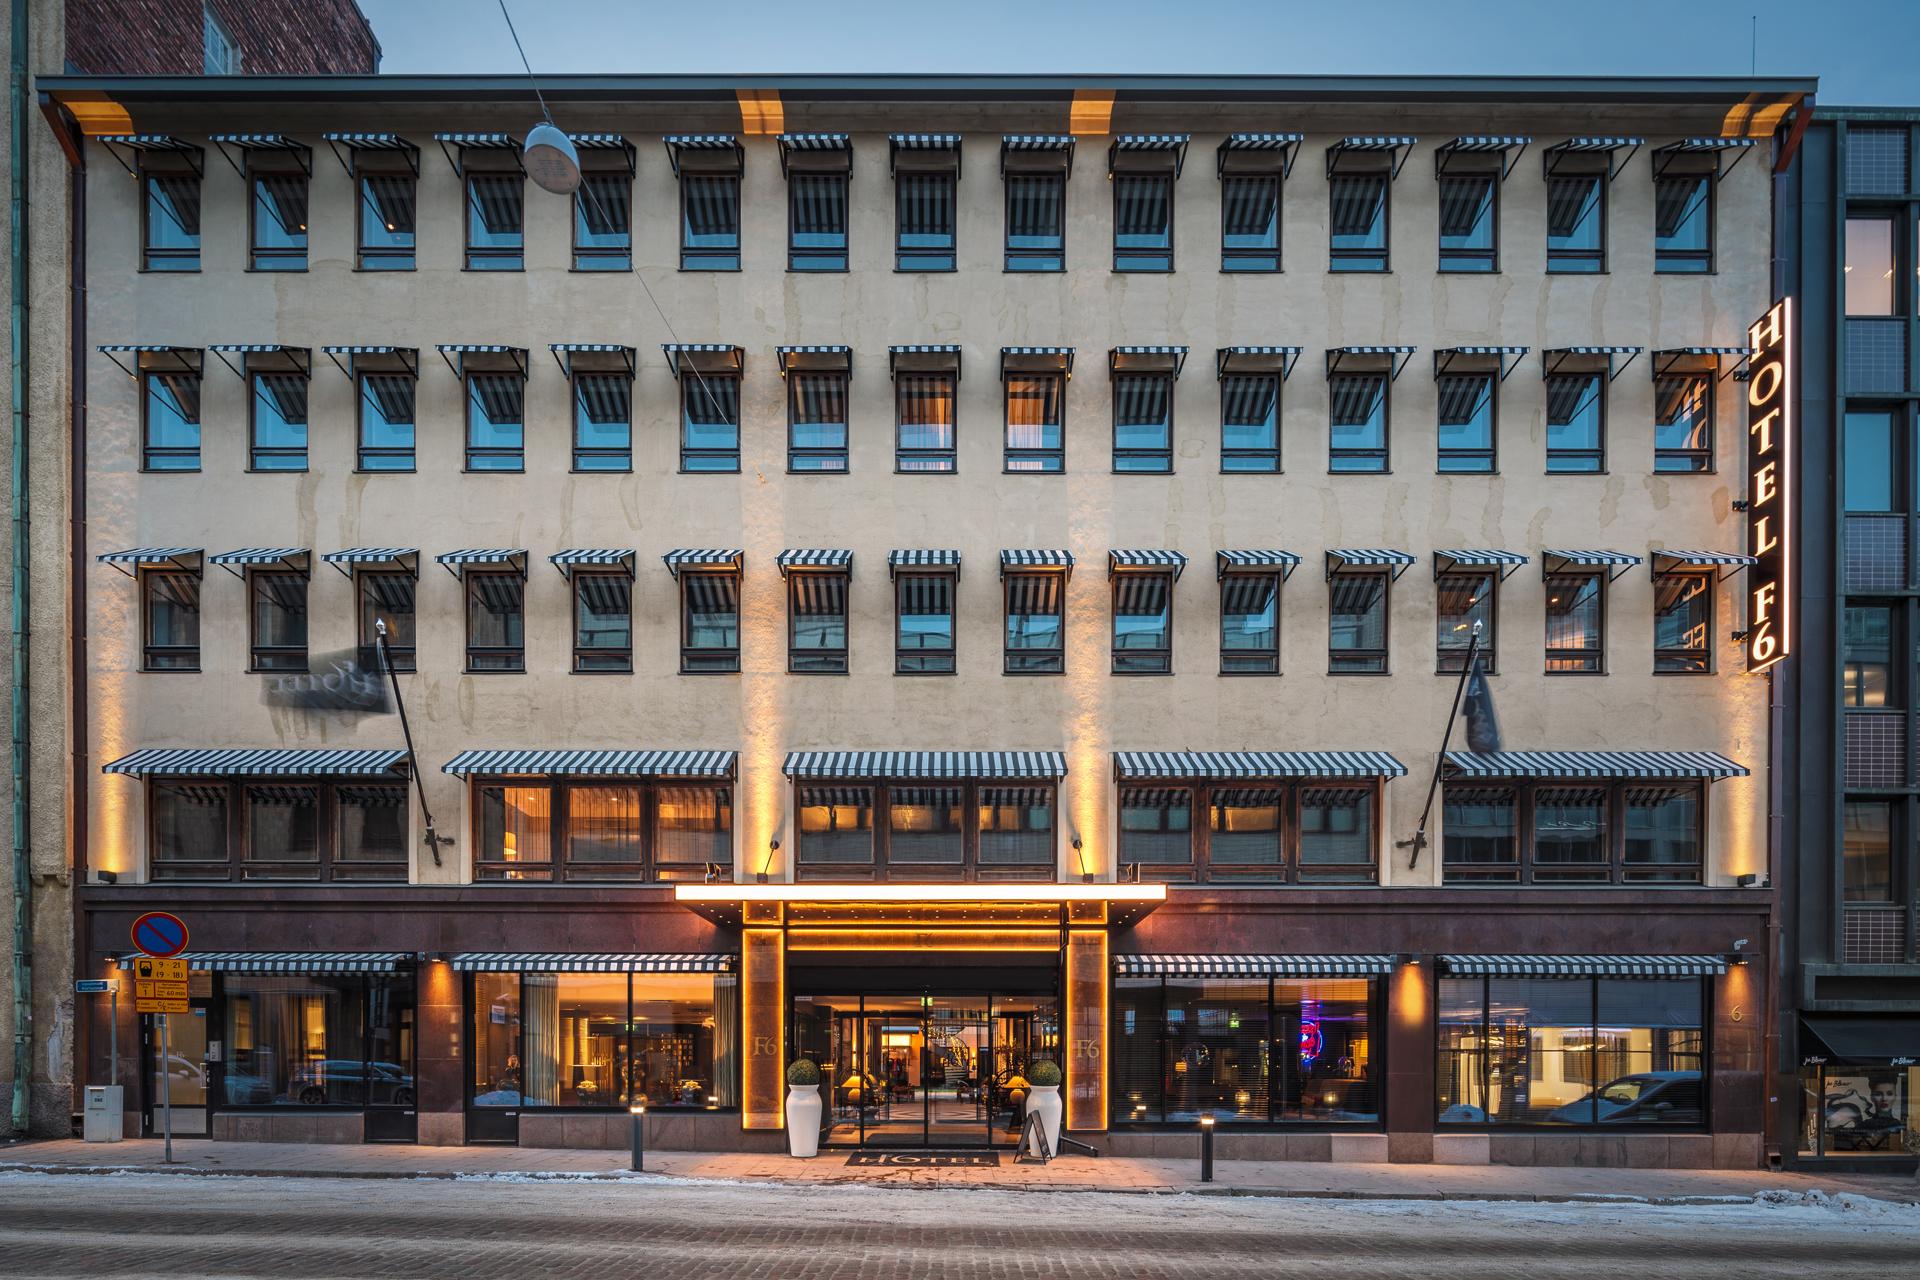 Hotel F6 / Helsinki, Finland